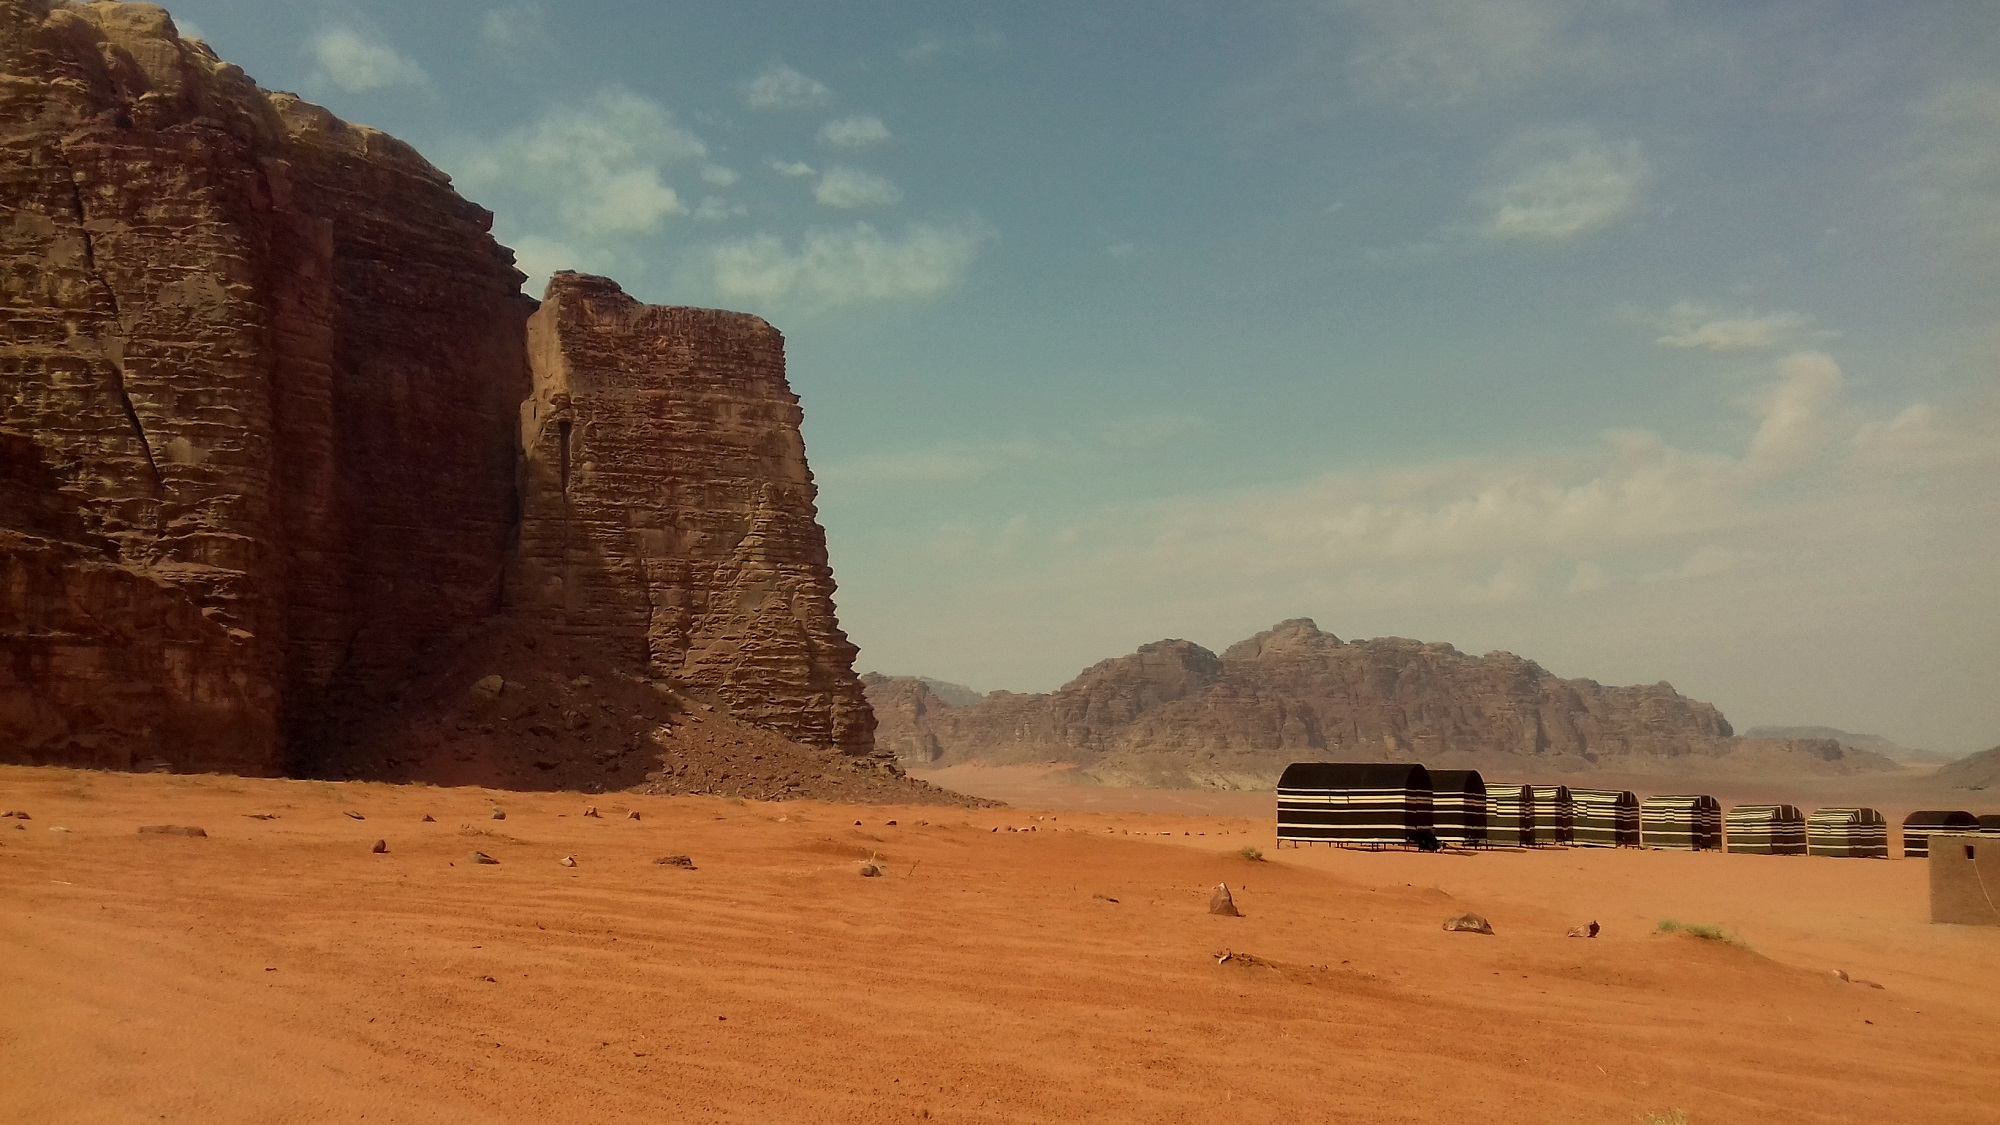 Jordánsko - Wadi Rum